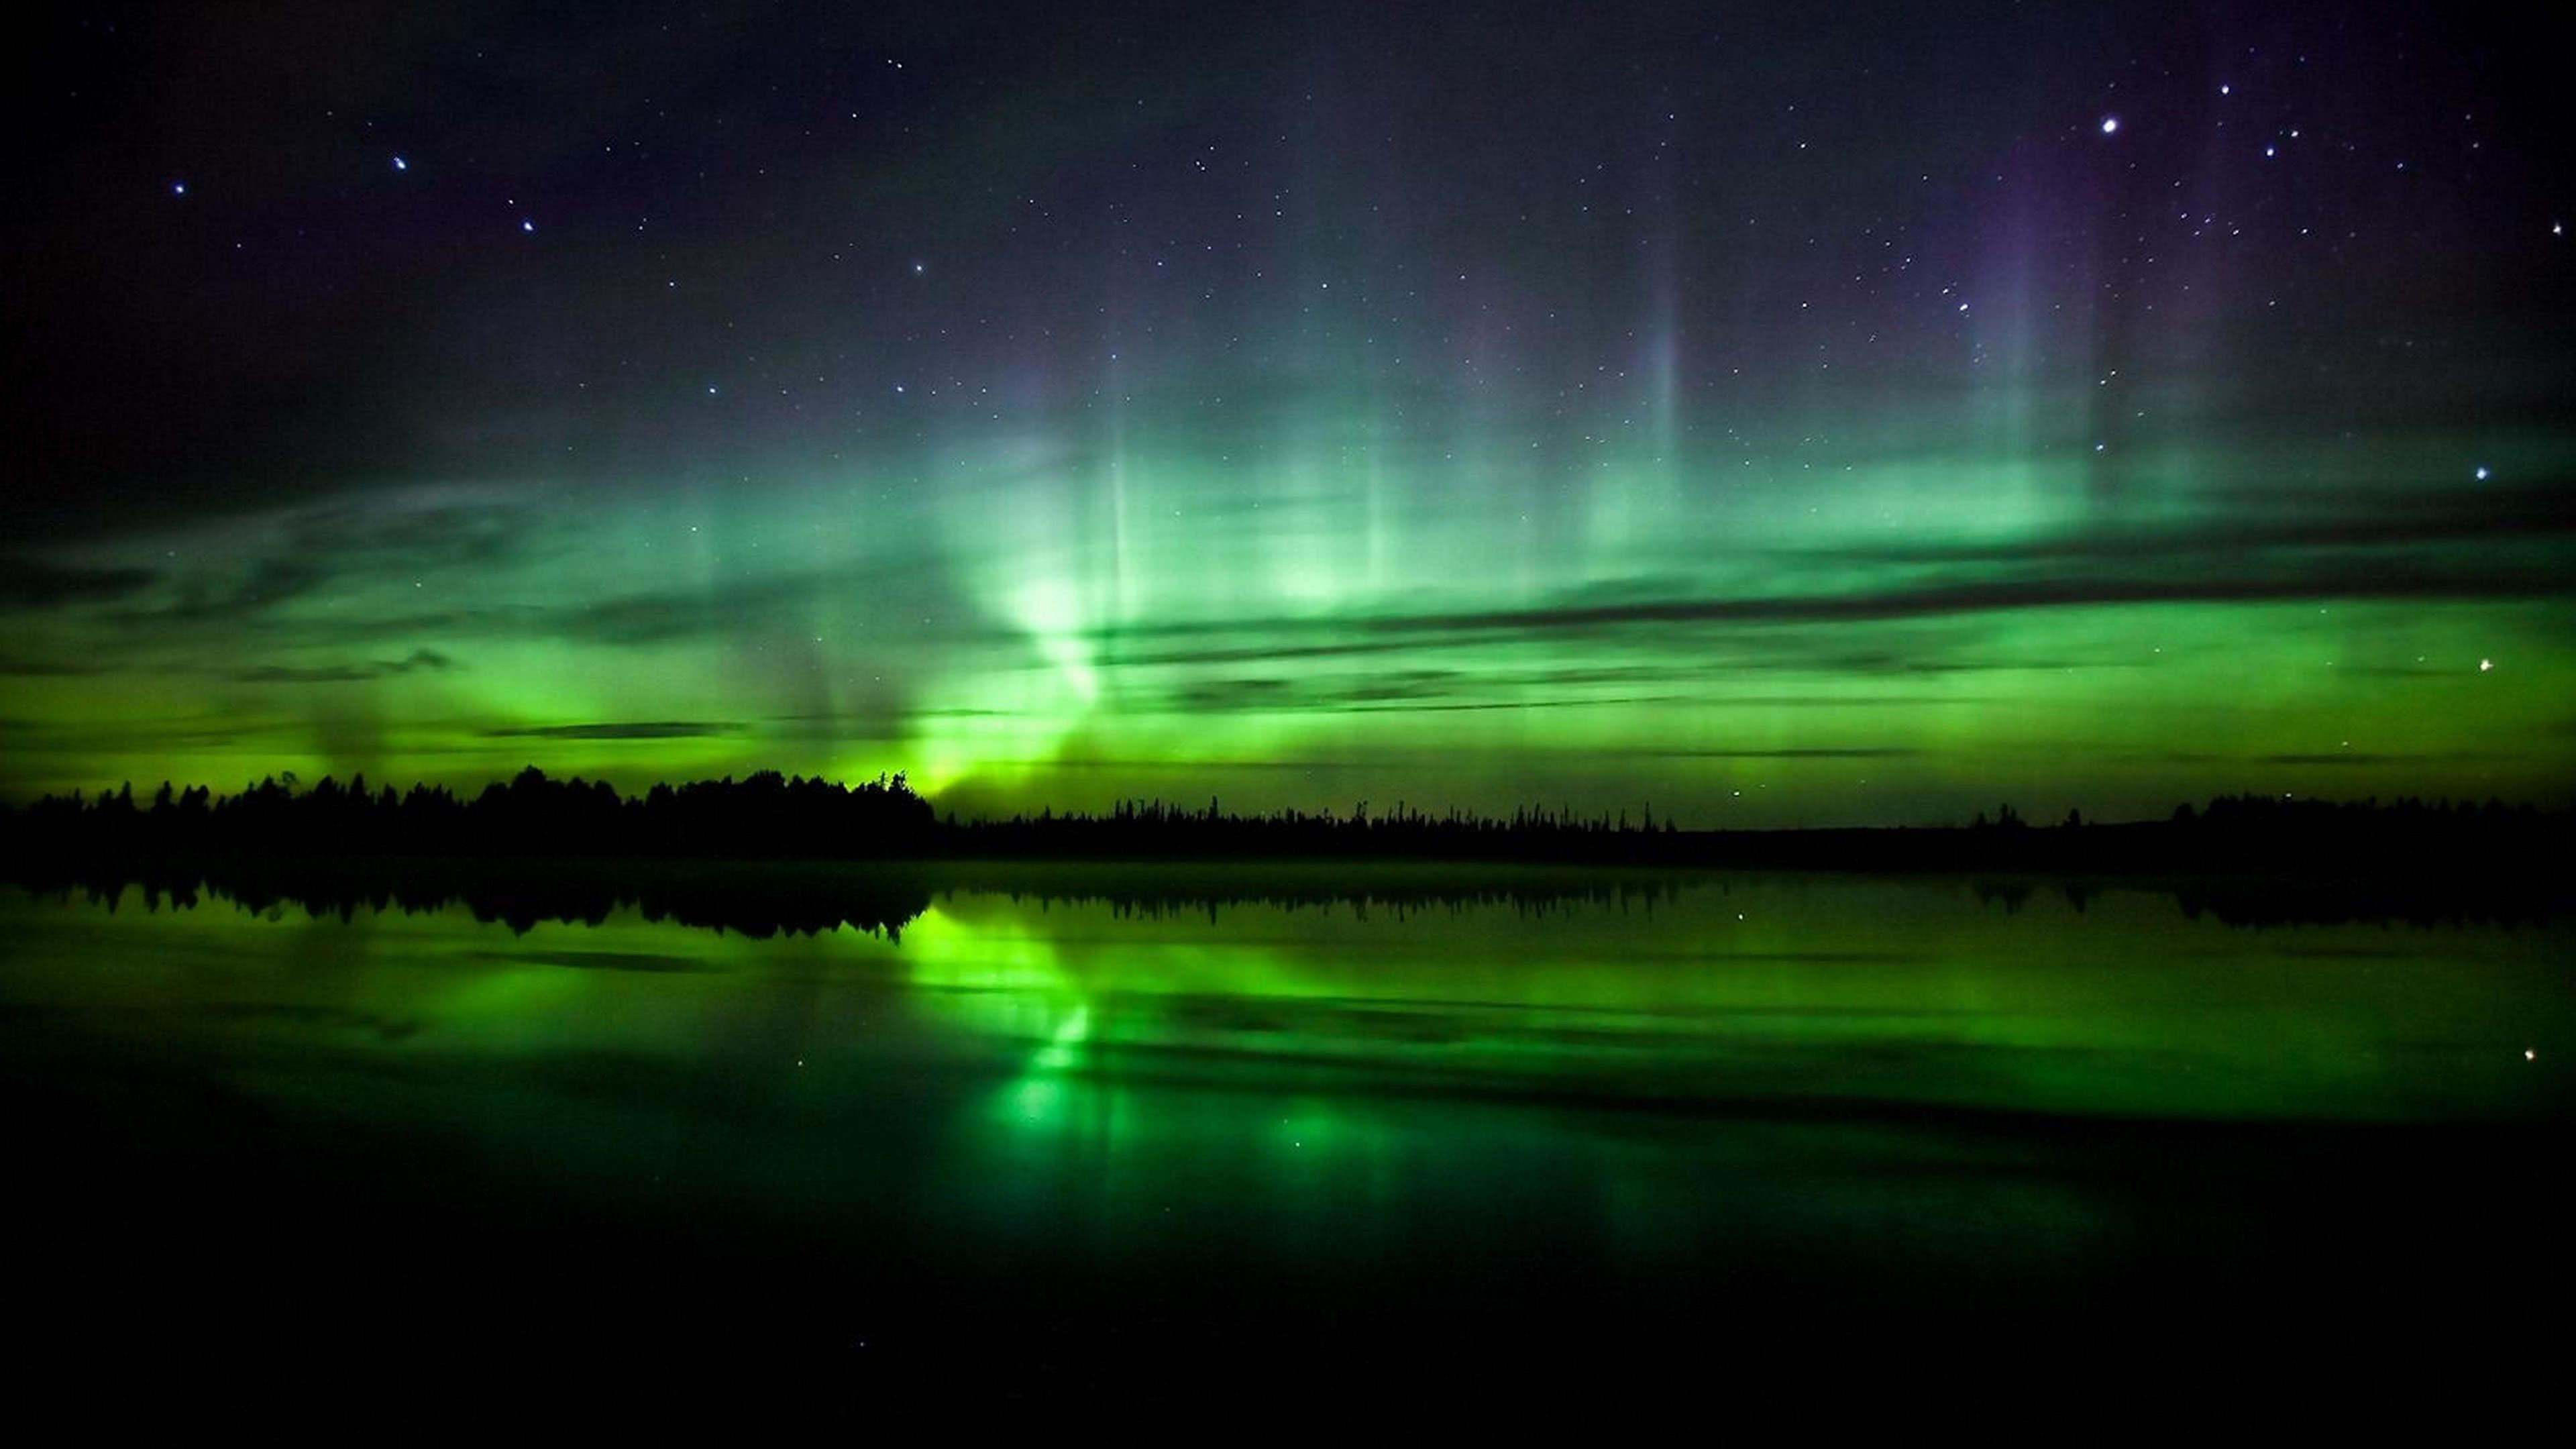 Mobile And Desktop Wallpaper Hd In 2020 Northern Lights Aurora Borealis Northern Lights Aurora Boreal